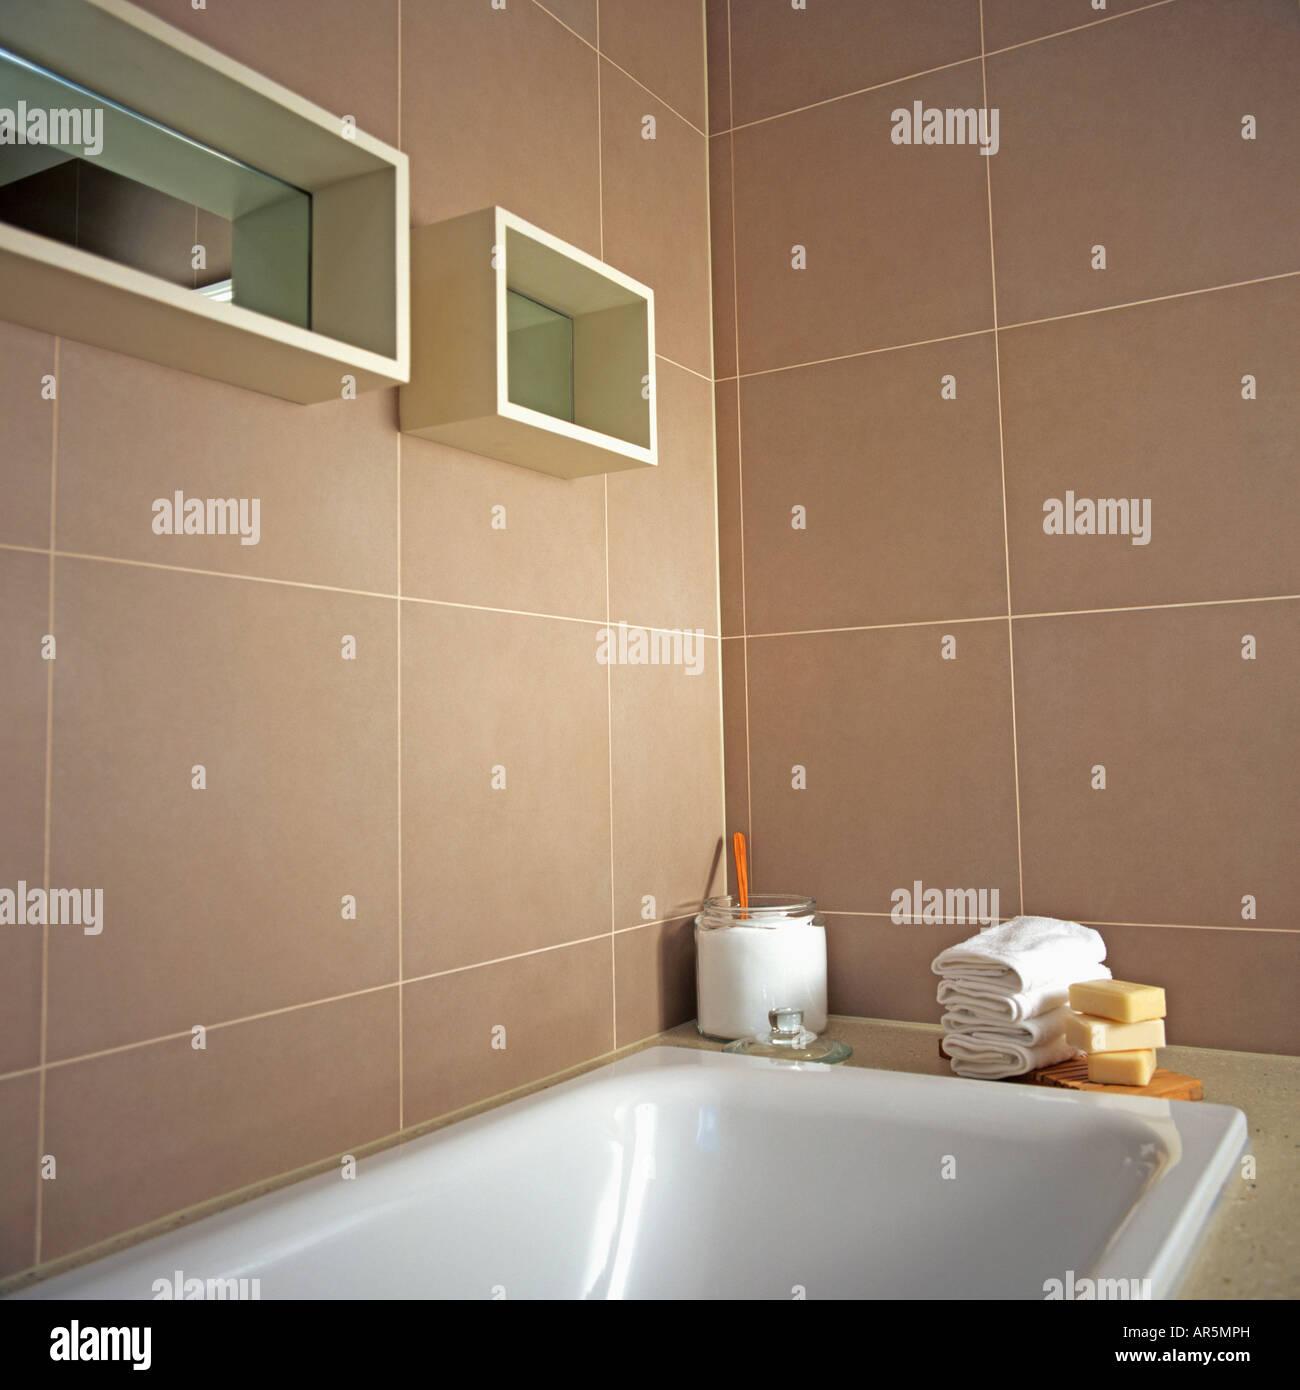 White Bath Below Mirrored Cube Shelves On Beige Tiled Walls